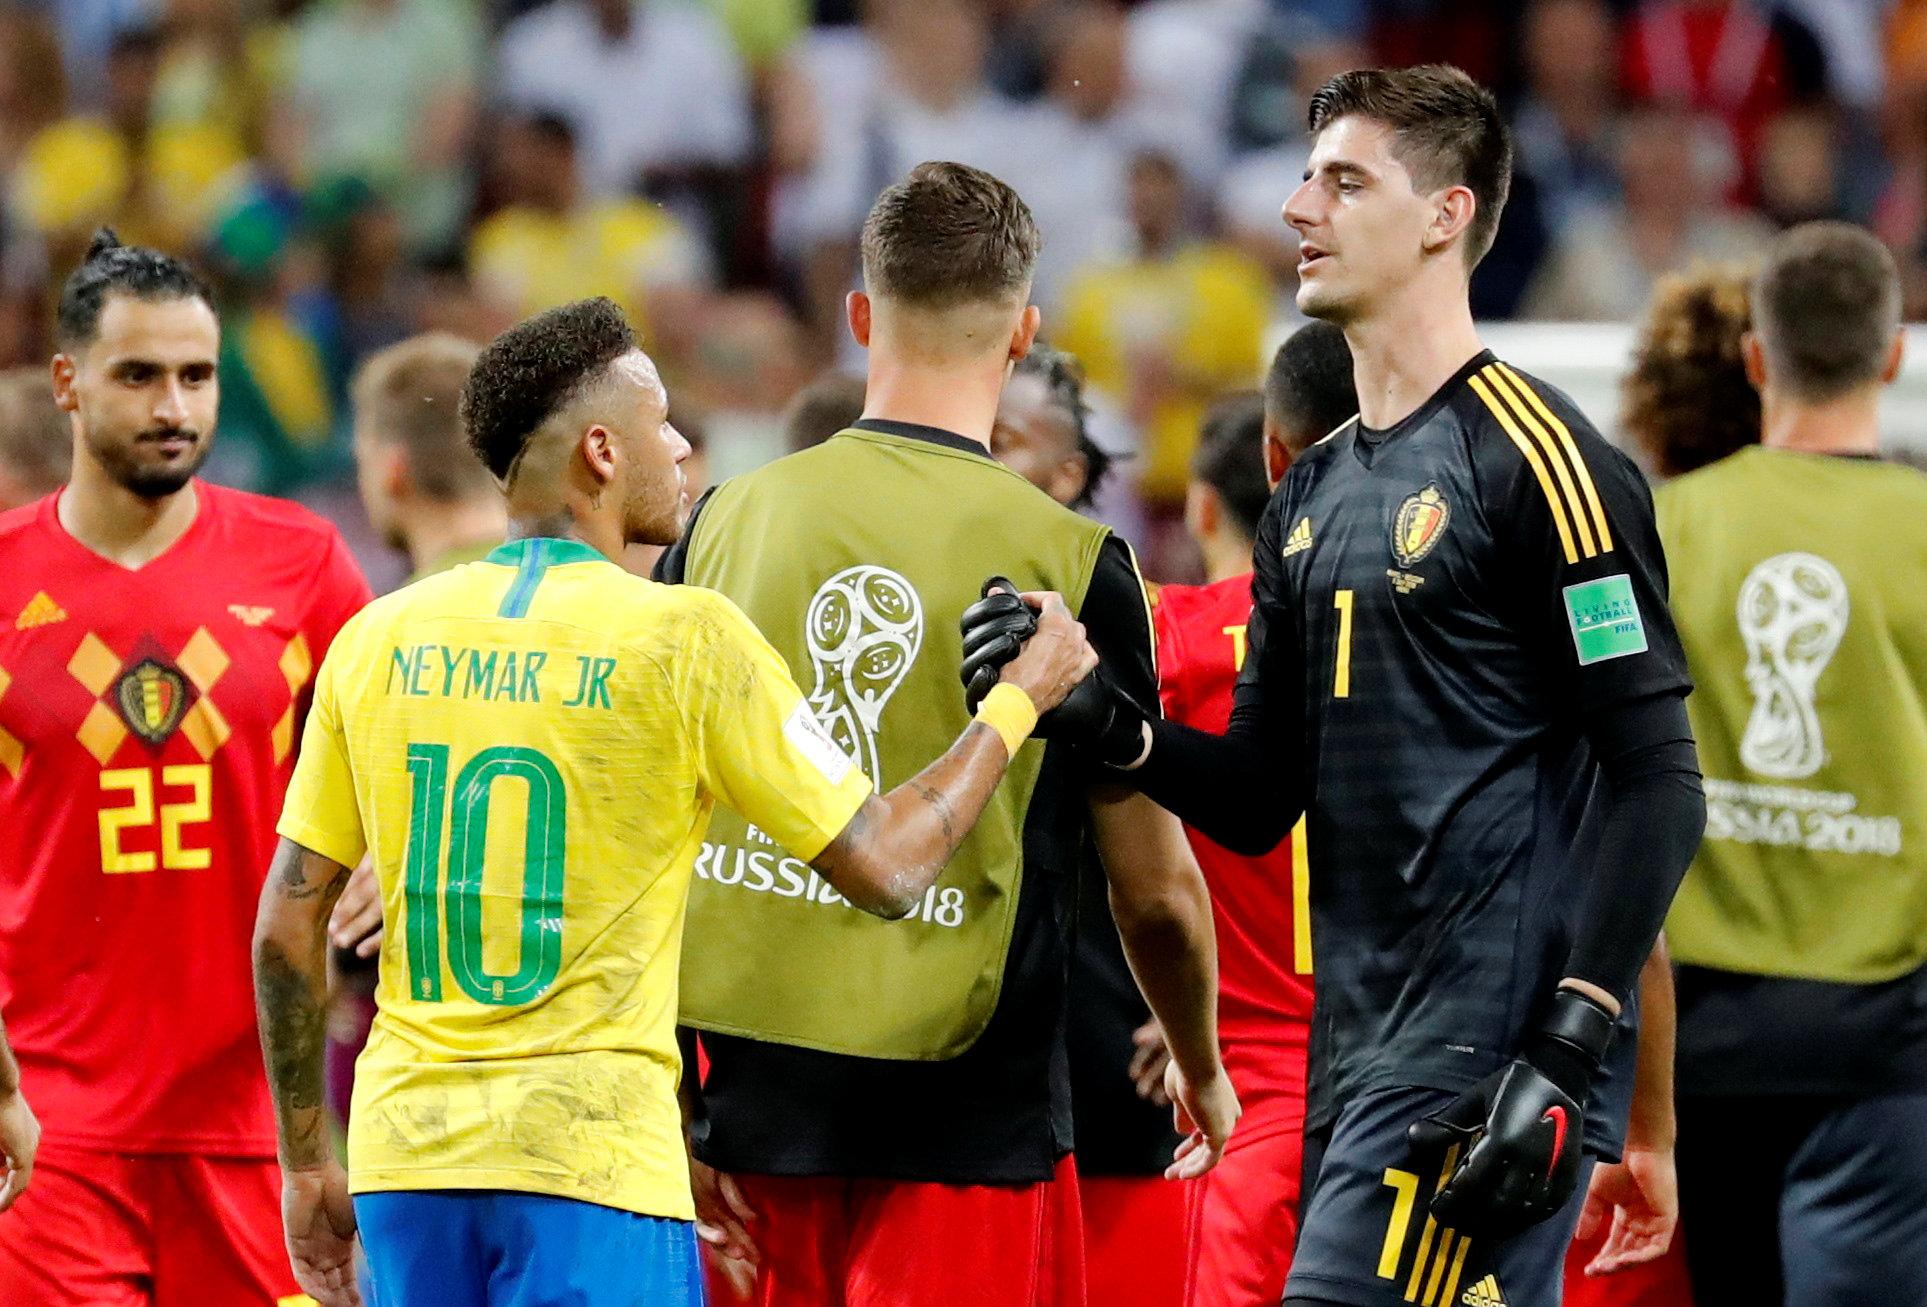 Soccer Football - World Cup - Quarter Final - Brazil vs Belgium - Kazan Arena, Kazan, Russia - July 6, 2018  Brazil's Neymar shakes hands with Belgium's Thibaut Courtois at the end of the match   Photo: REUTERS